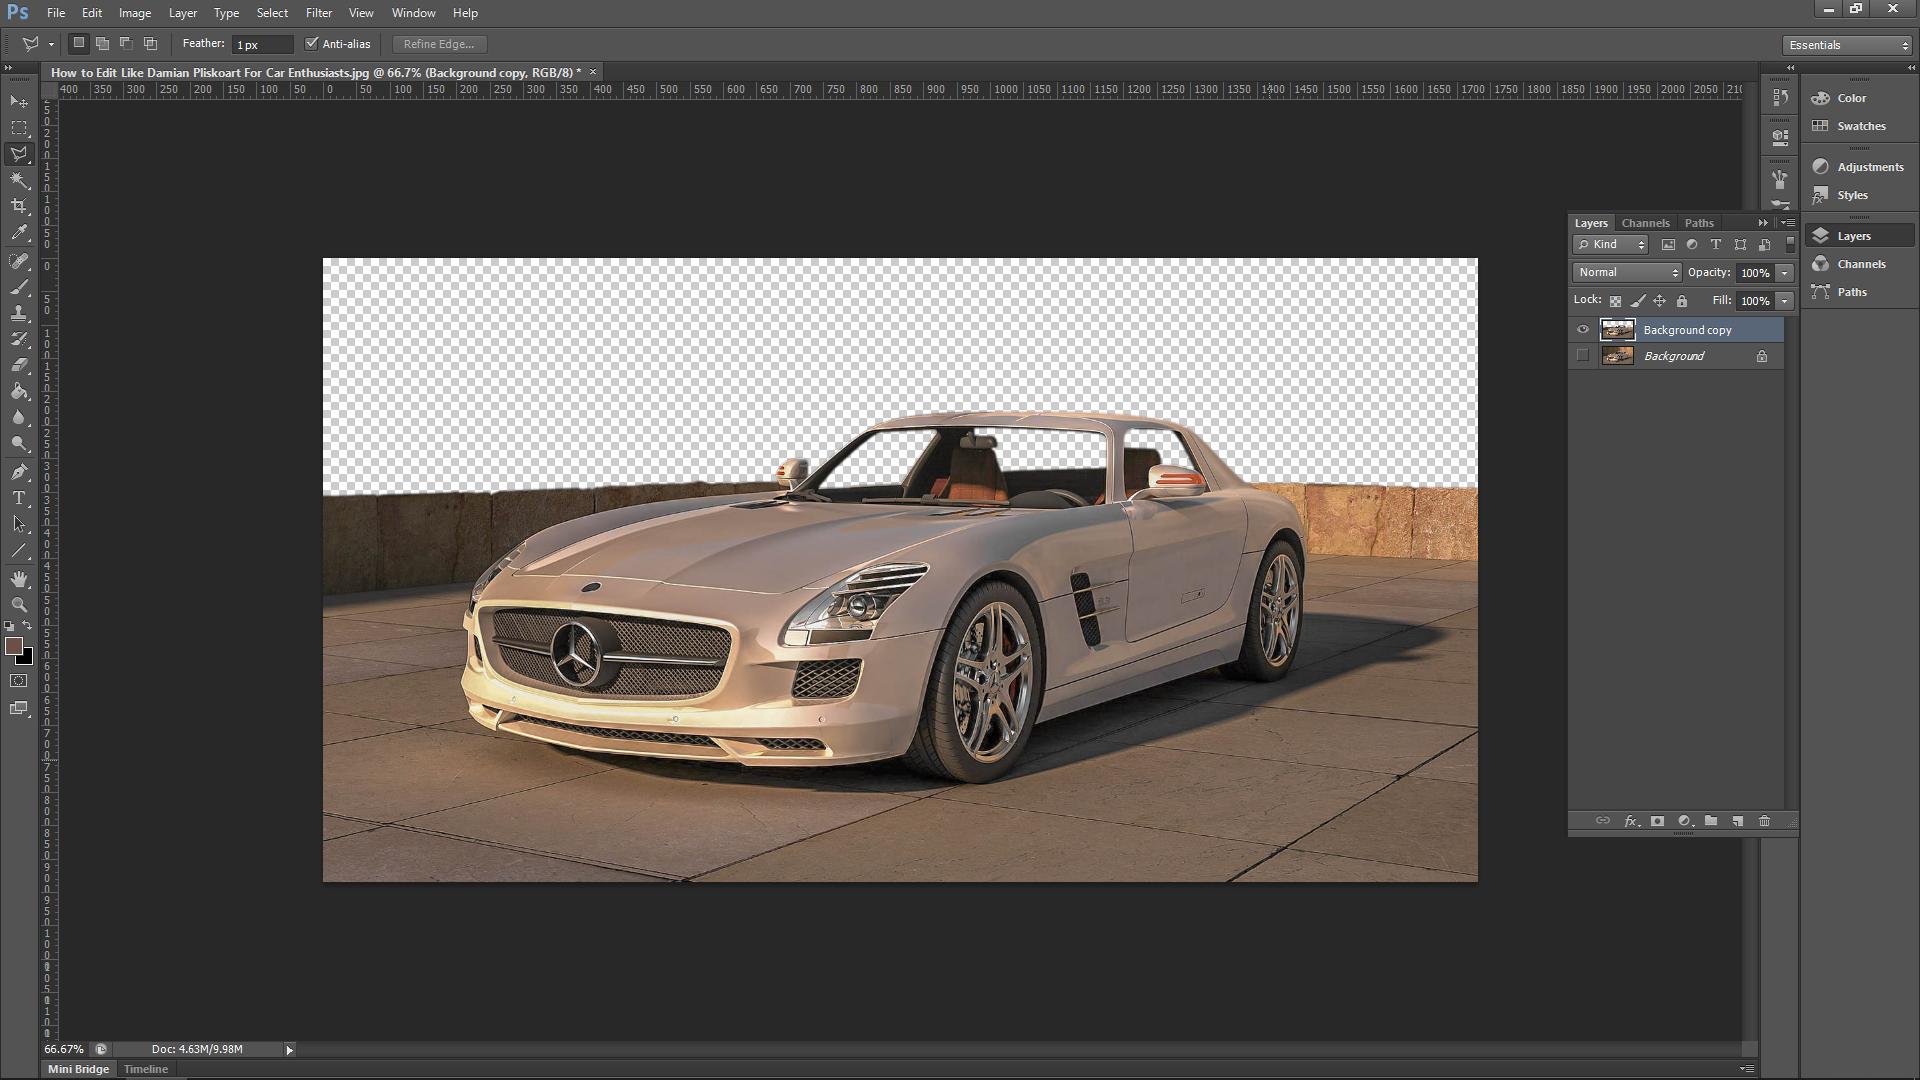 Photoshop Car Editing